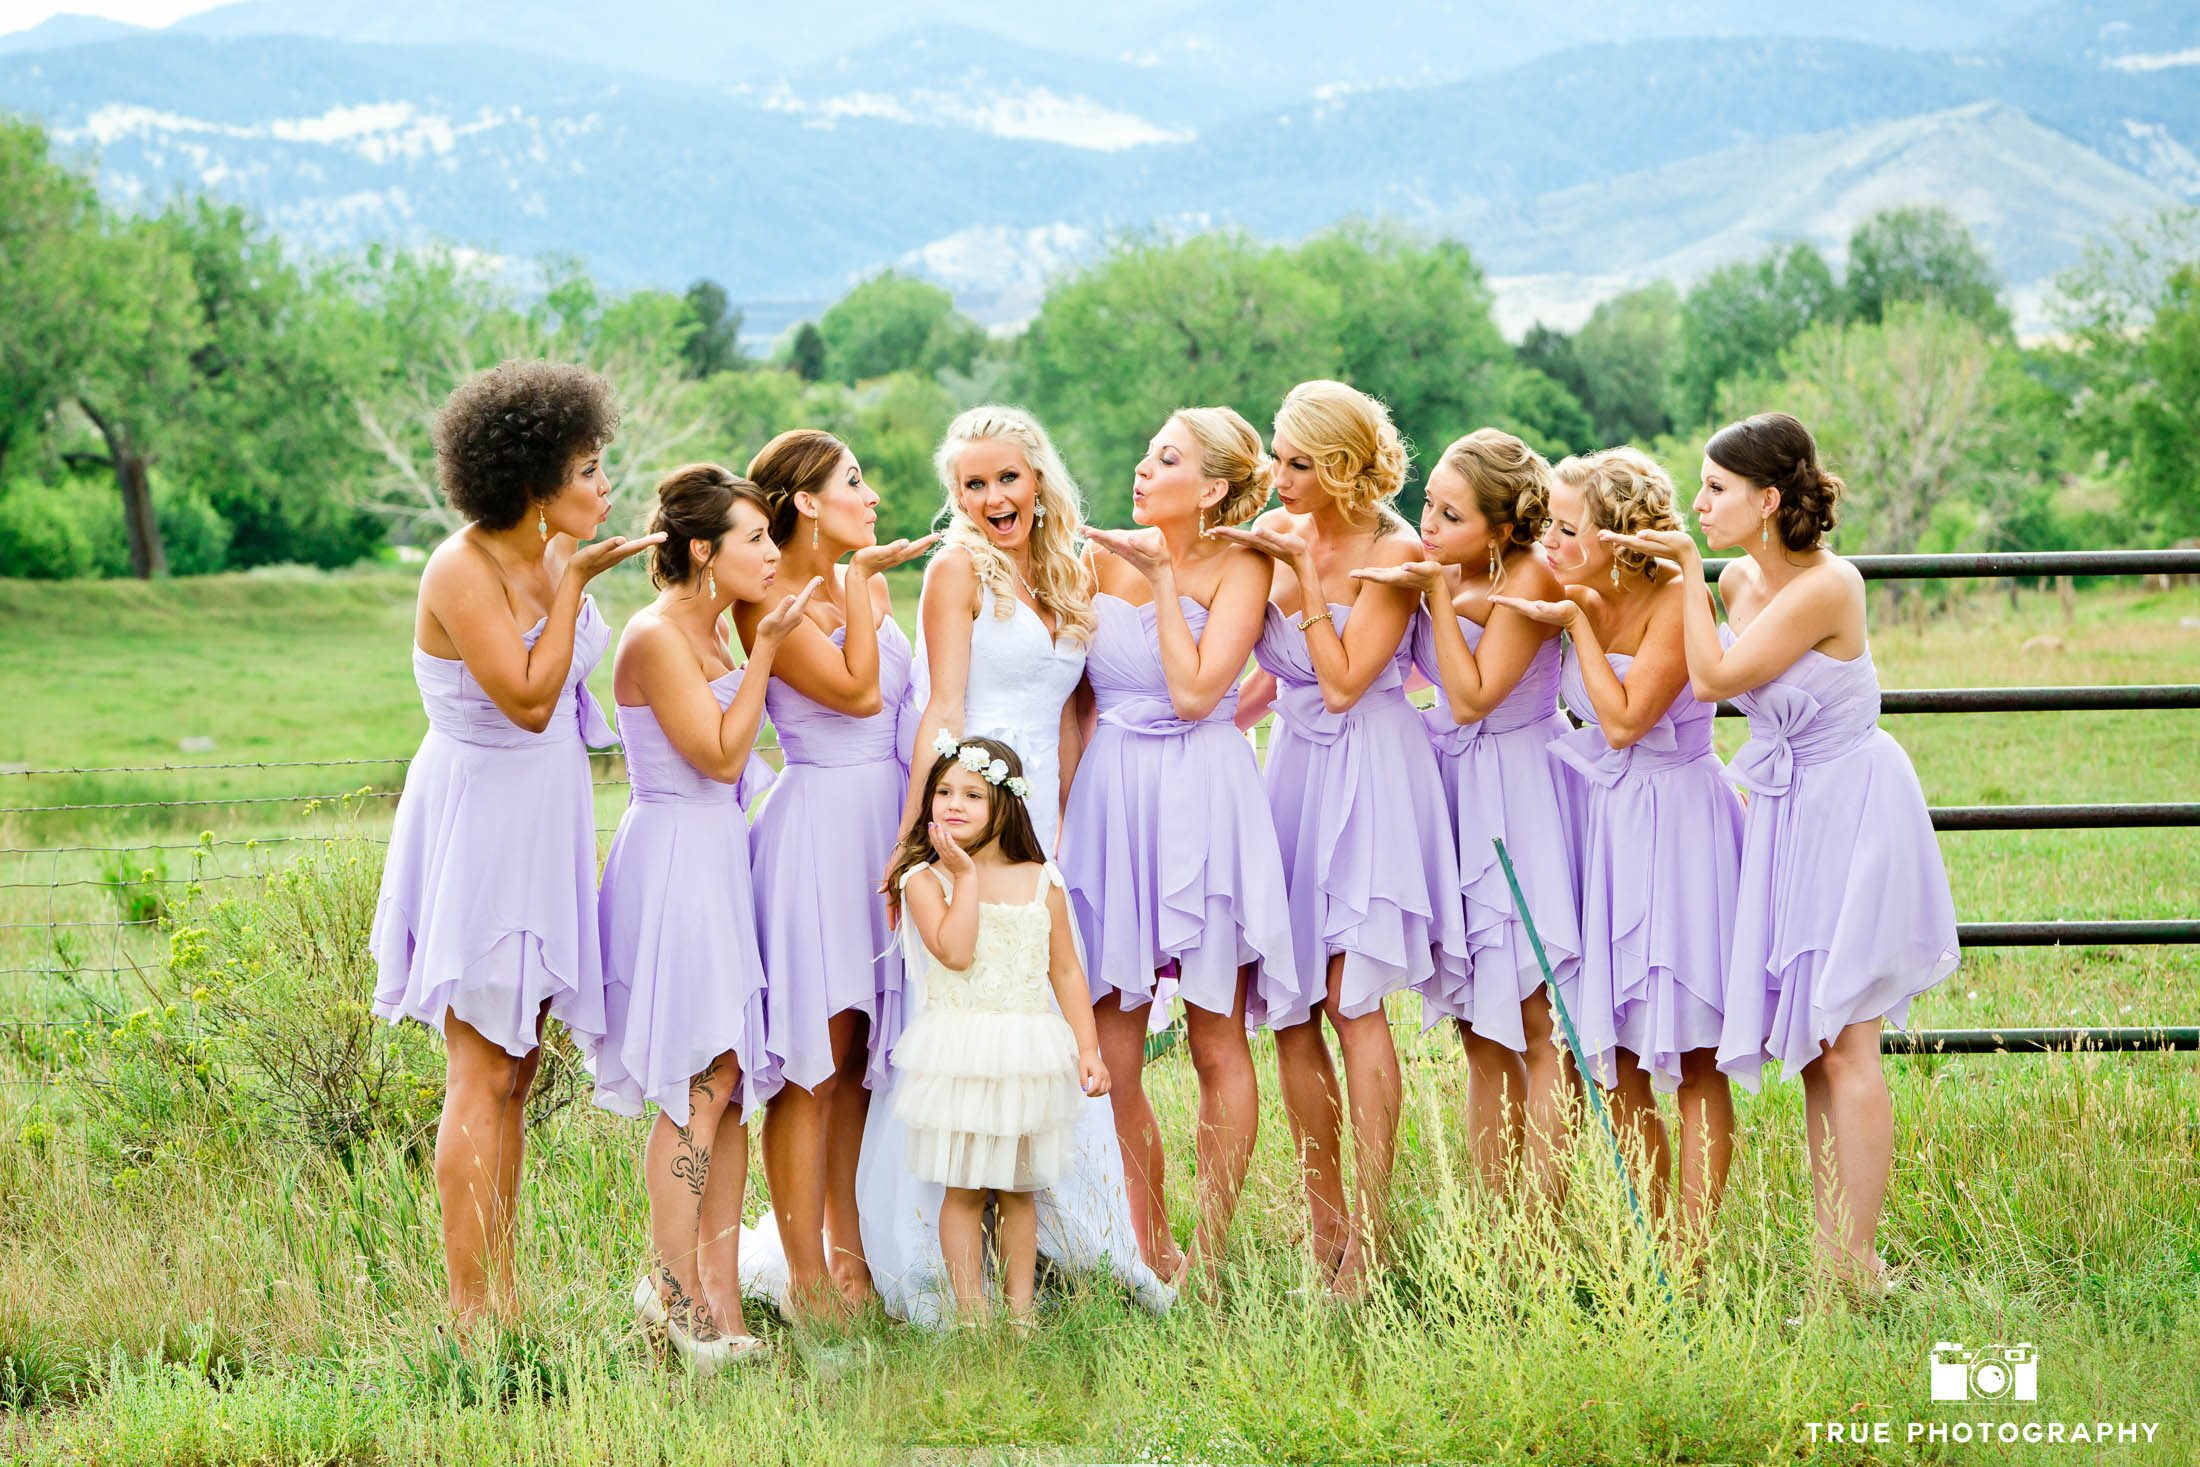 Bridesmaids blow kiss towards bride